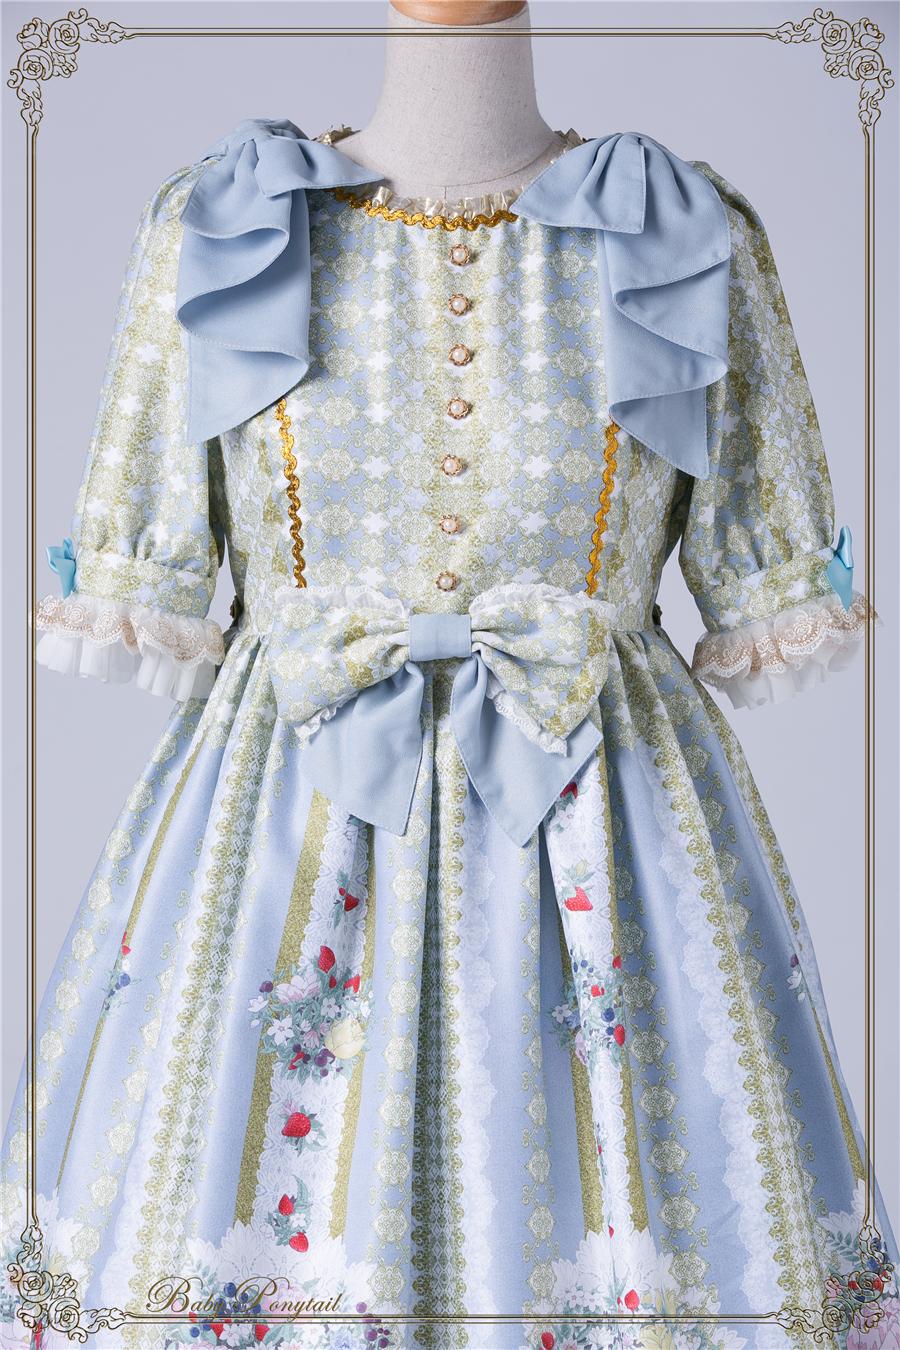 Baby Ponytail_Stock Photo_Rococo Bouquet_OP Sax_1.jpg